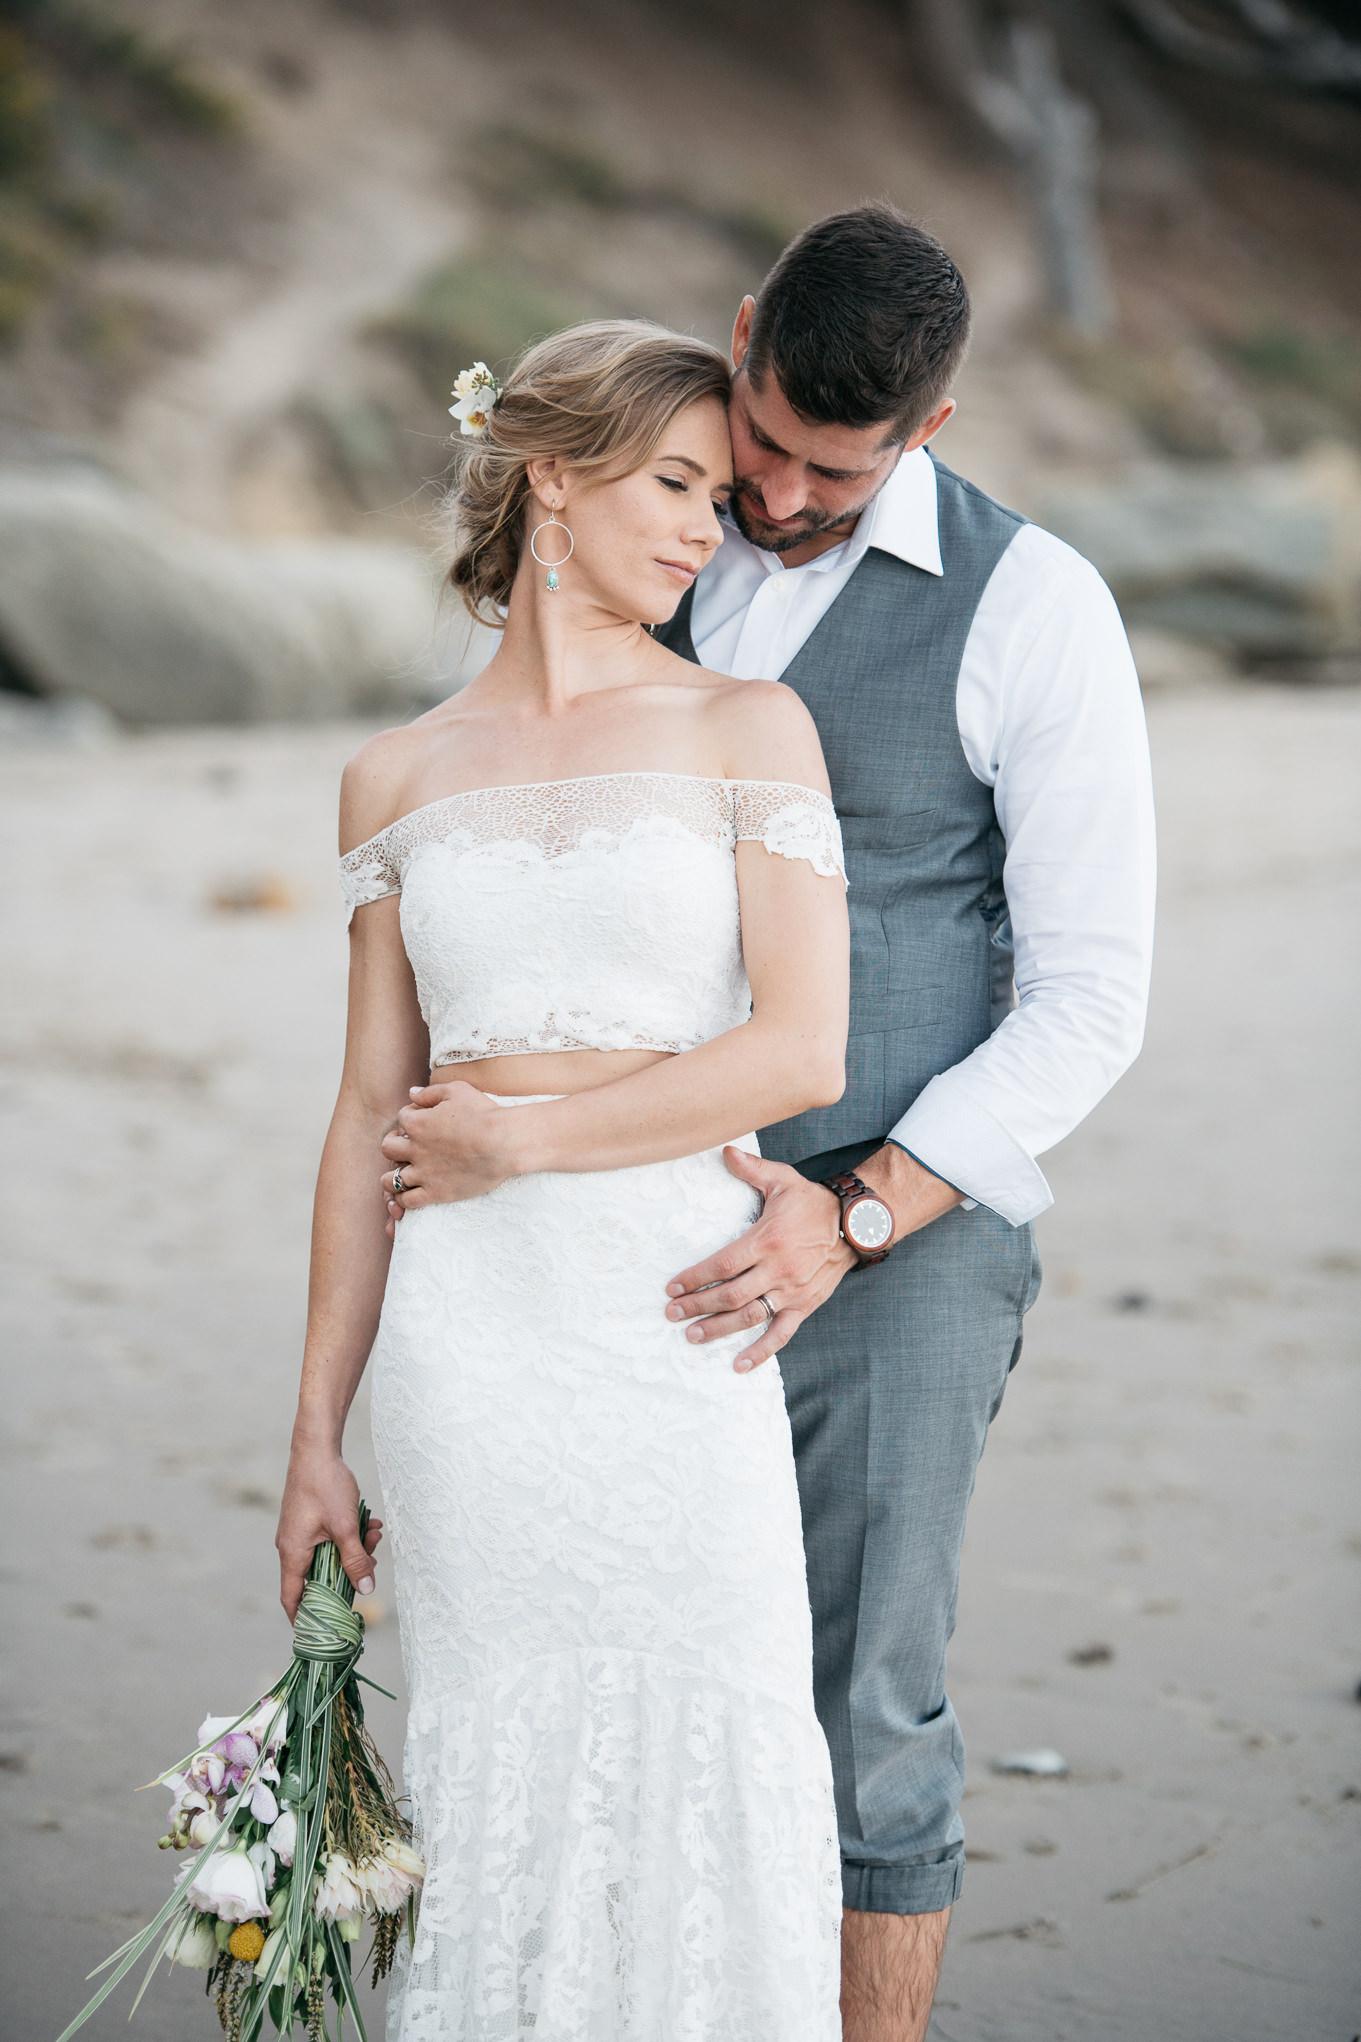 683_ONL_Jenny_Ken_Wedding_Trevor_Hooper_Photo.jpg